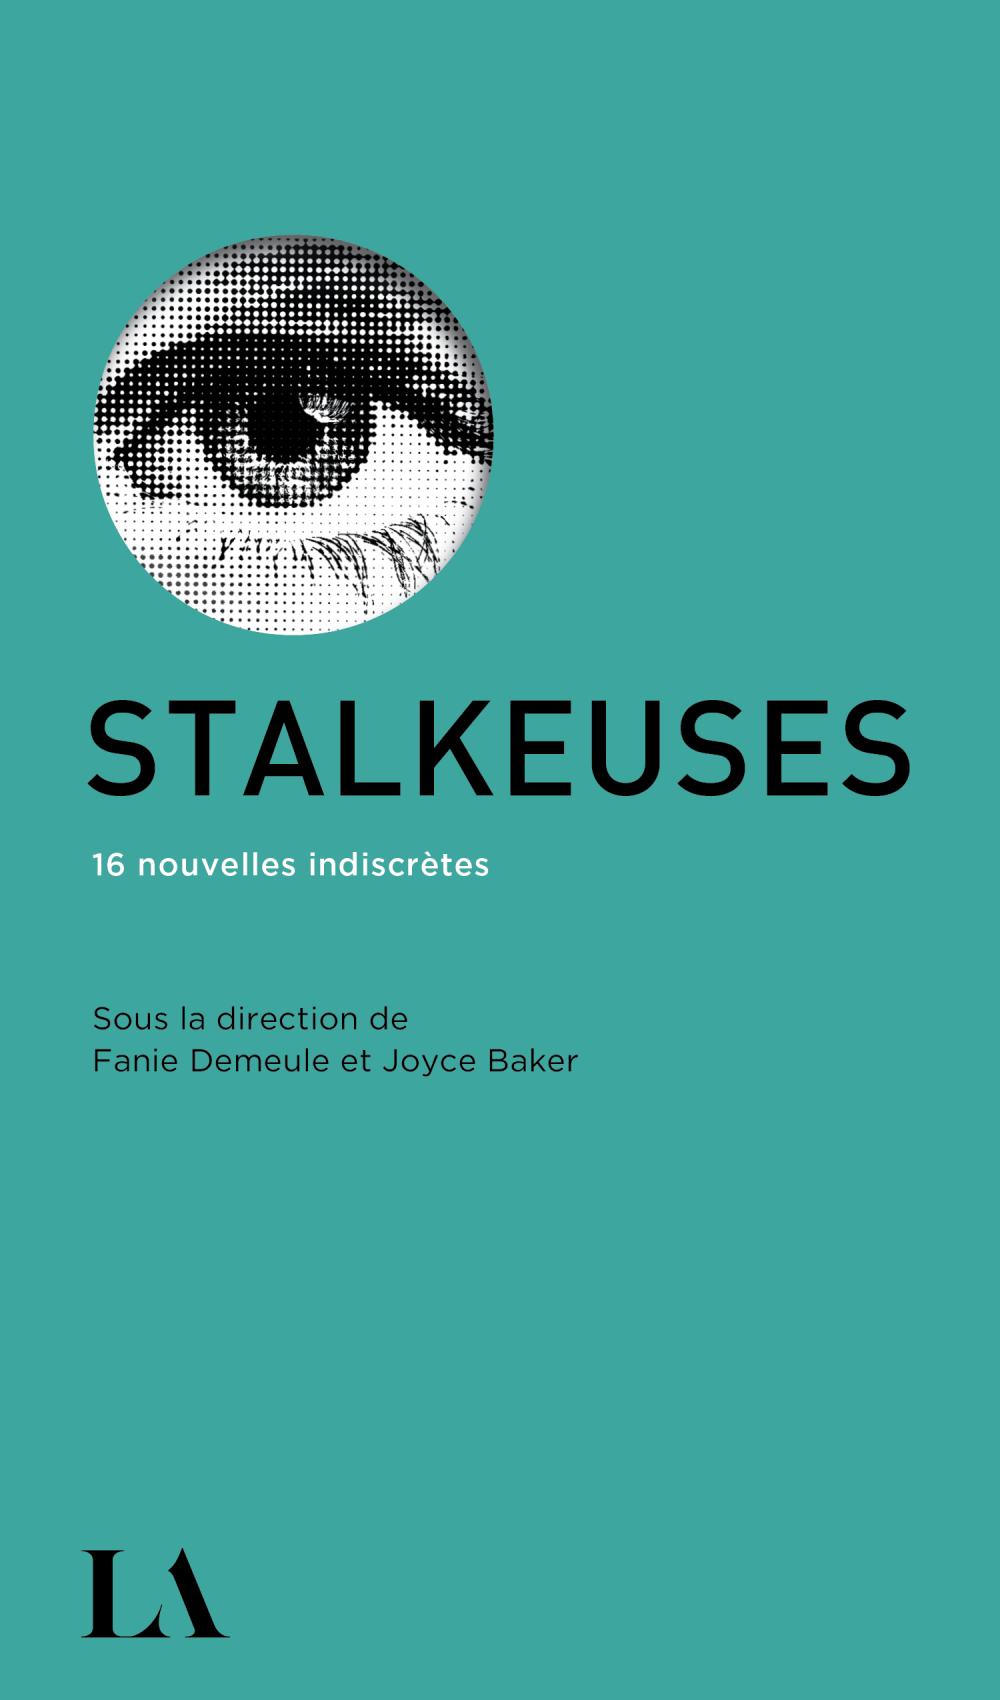 Stalkeuses. 16 nouvelles indiscretes